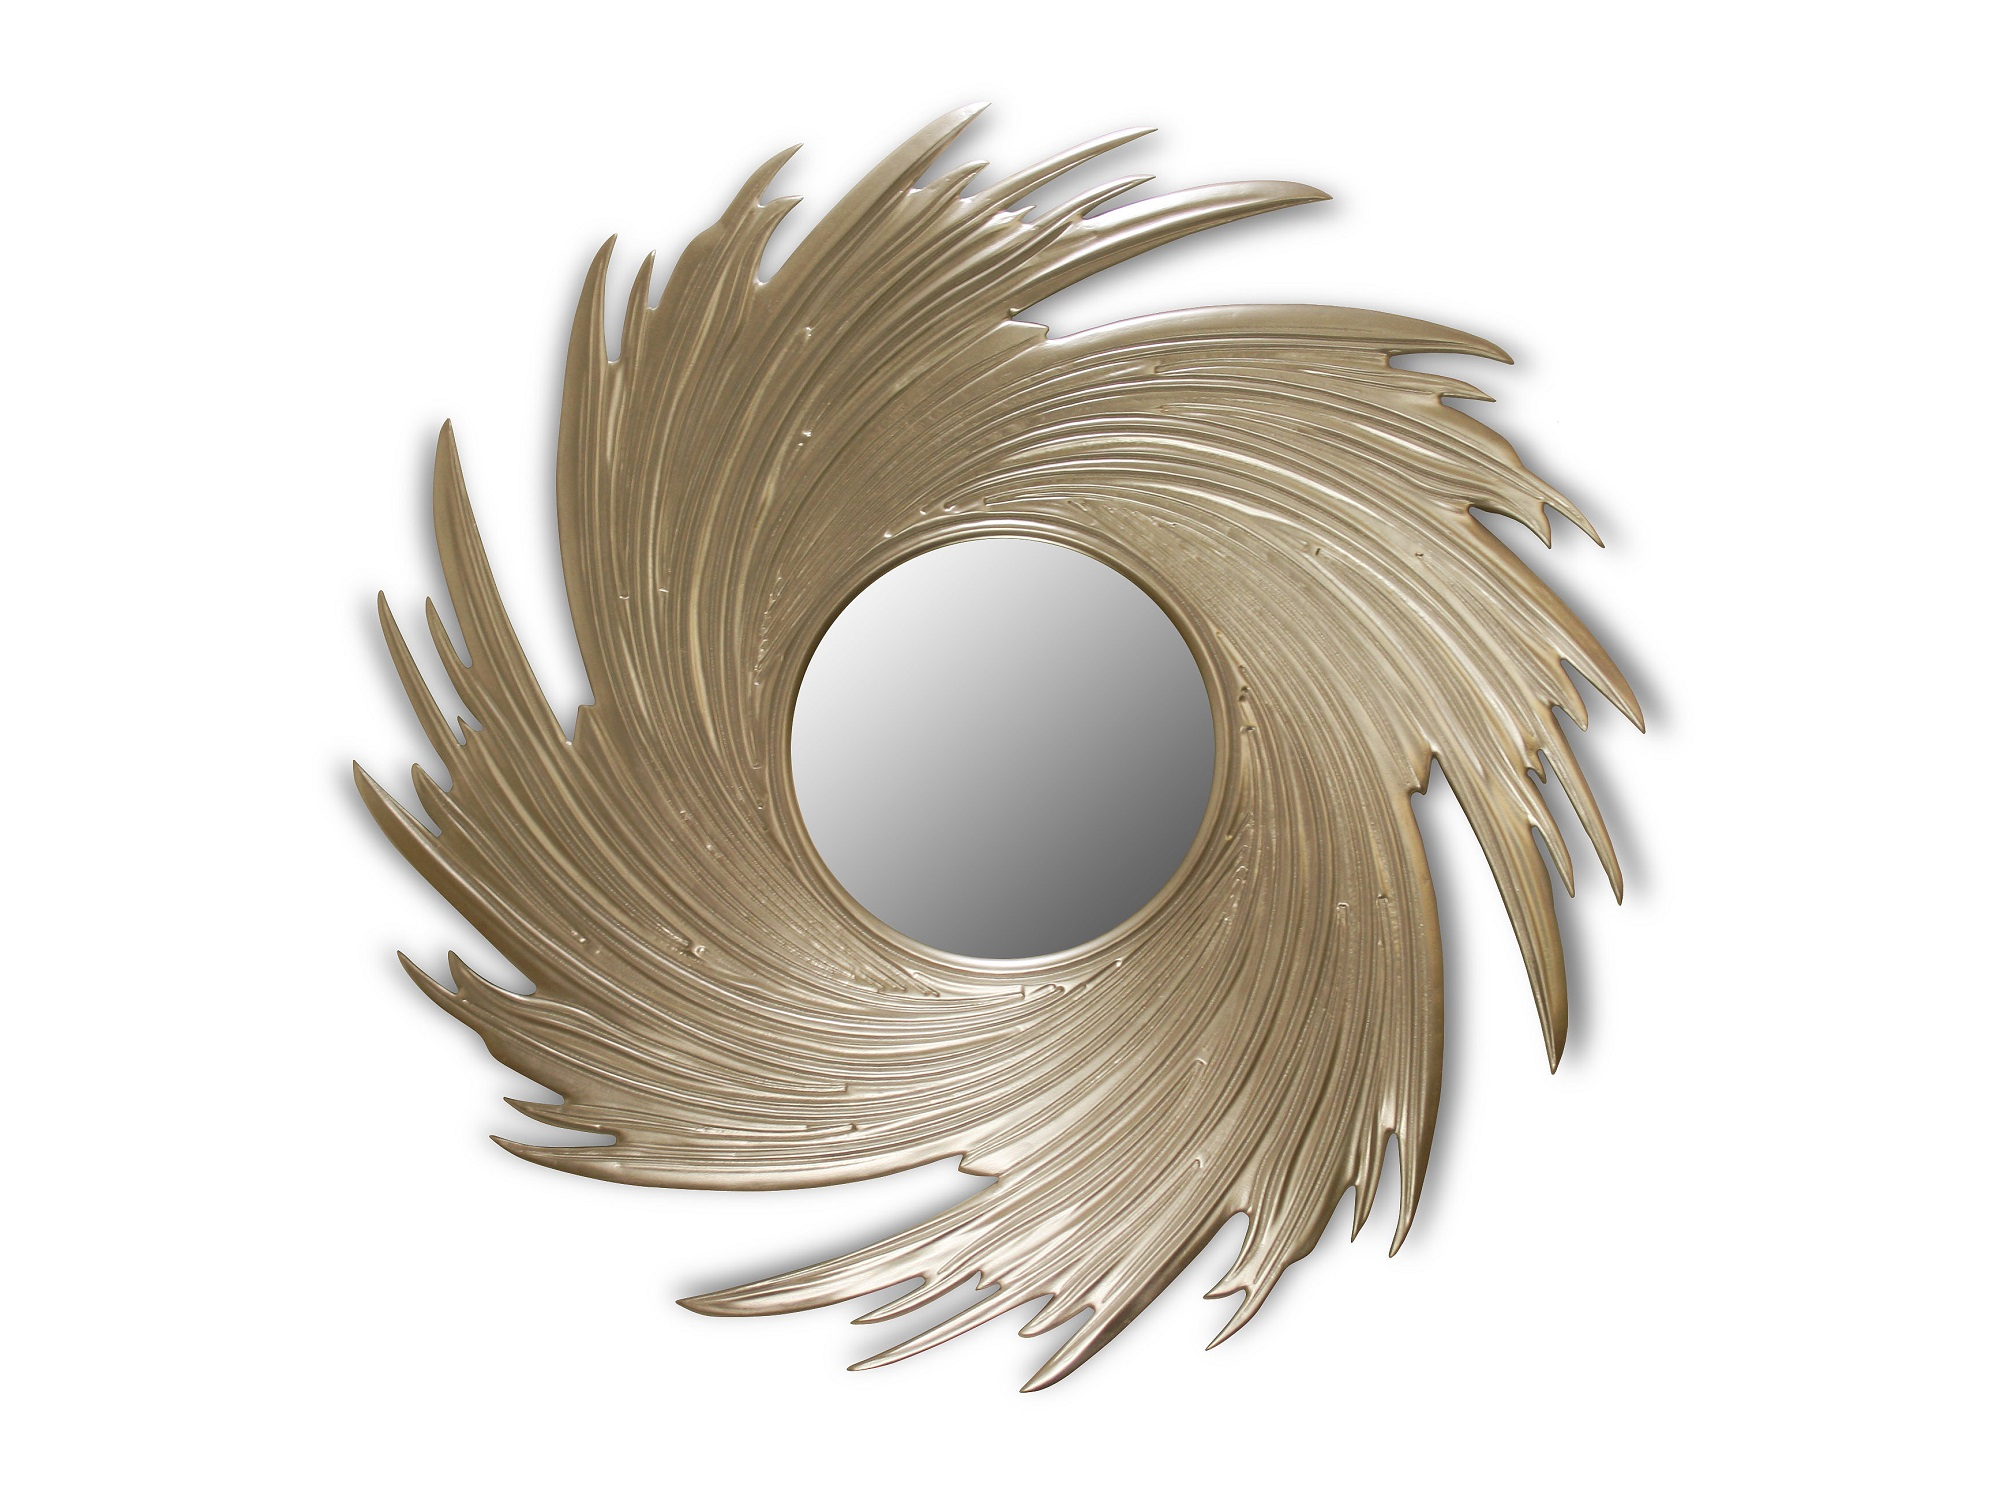 Зеркало VortexНастенные зеркала<br><br><br>Material: Дерево<br>Глубина см: 1.0